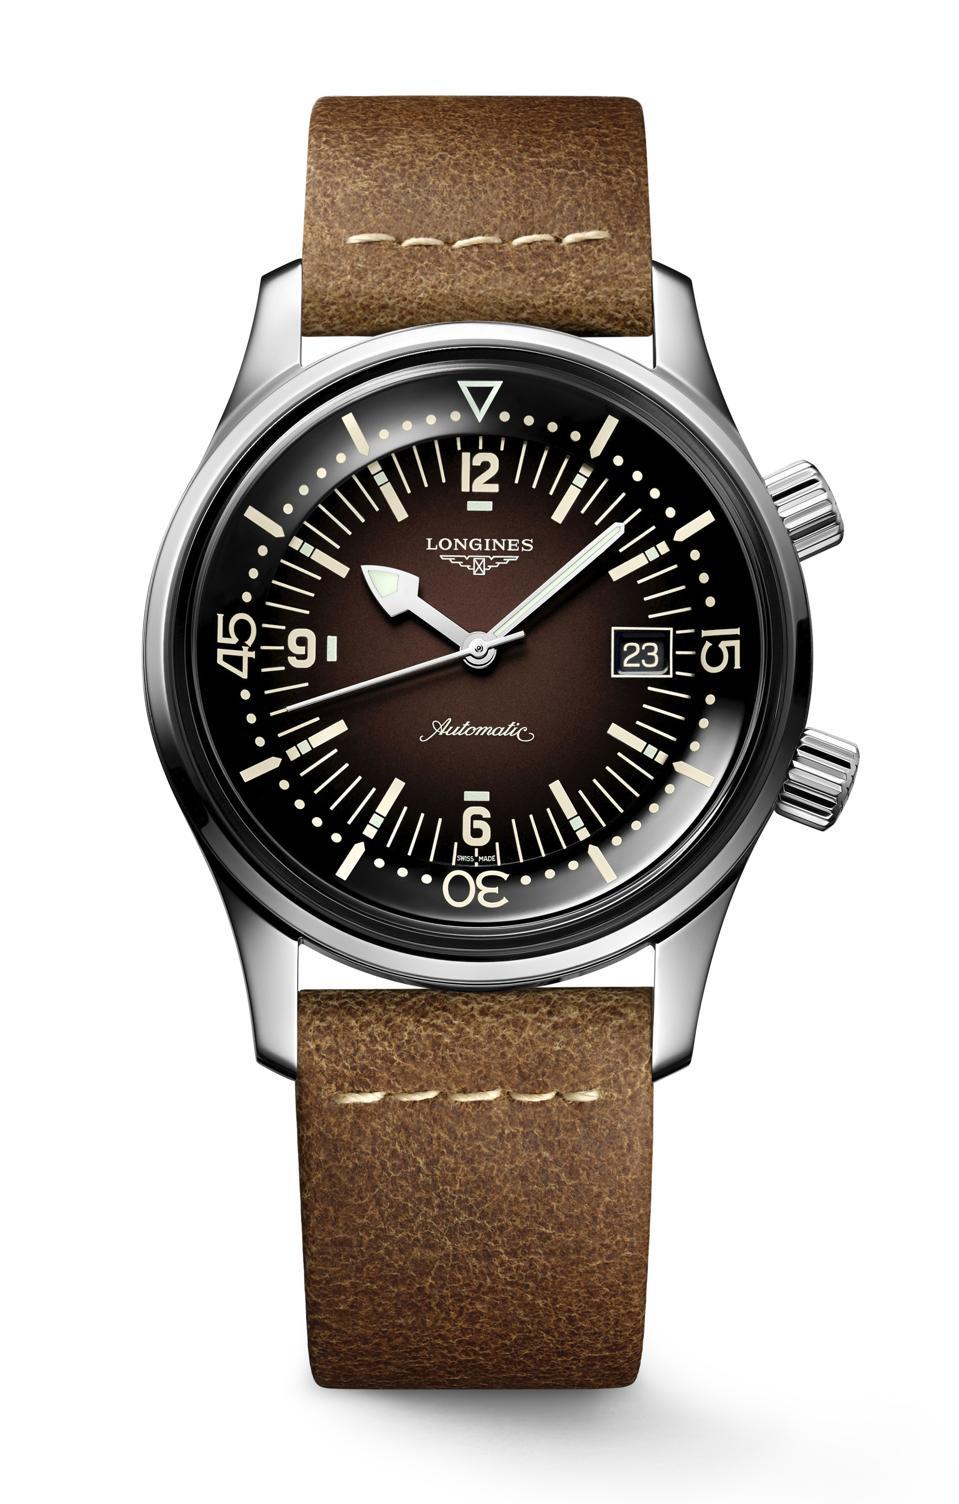 Longines Legend Diver with gradient brown dial